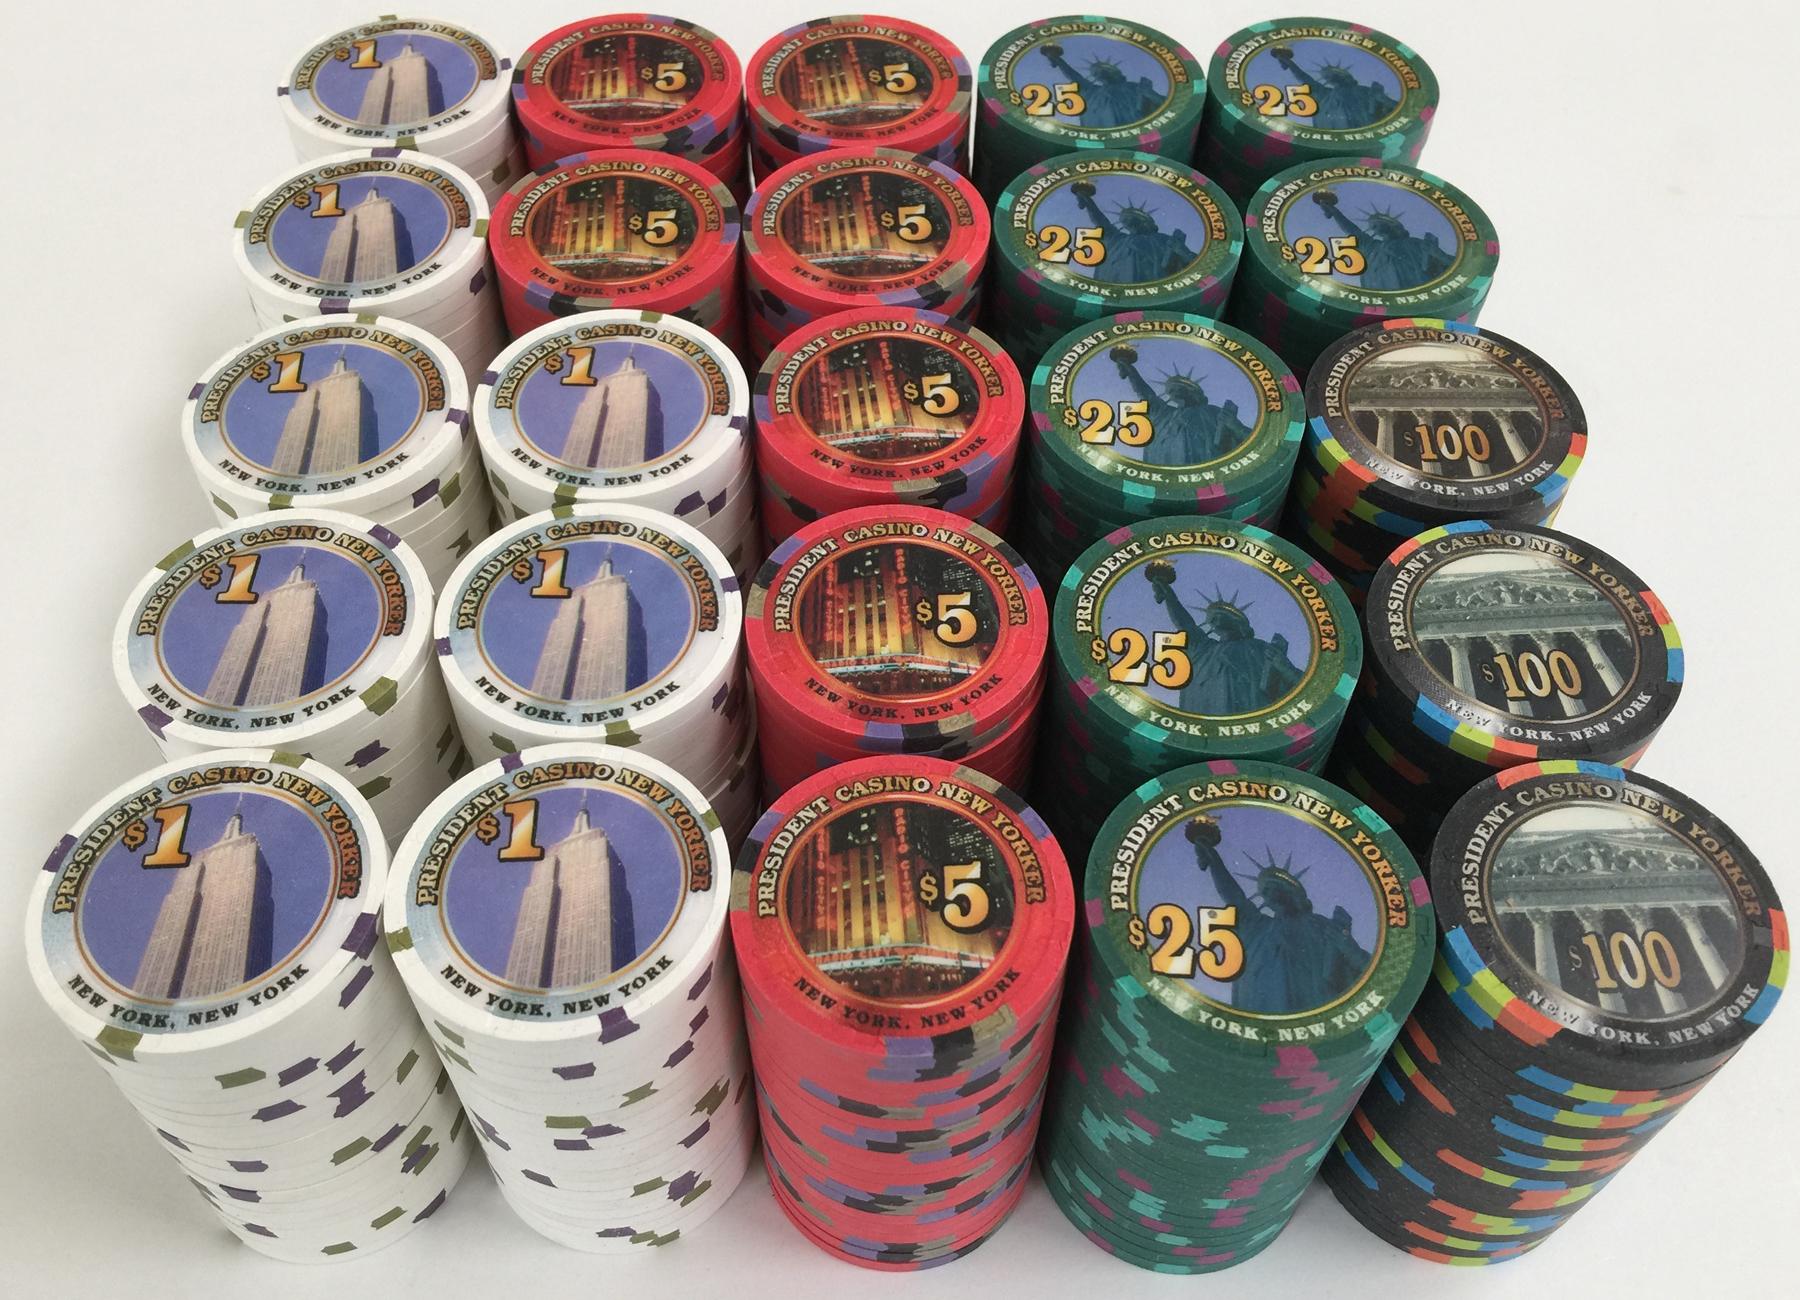 Most popular online poker games